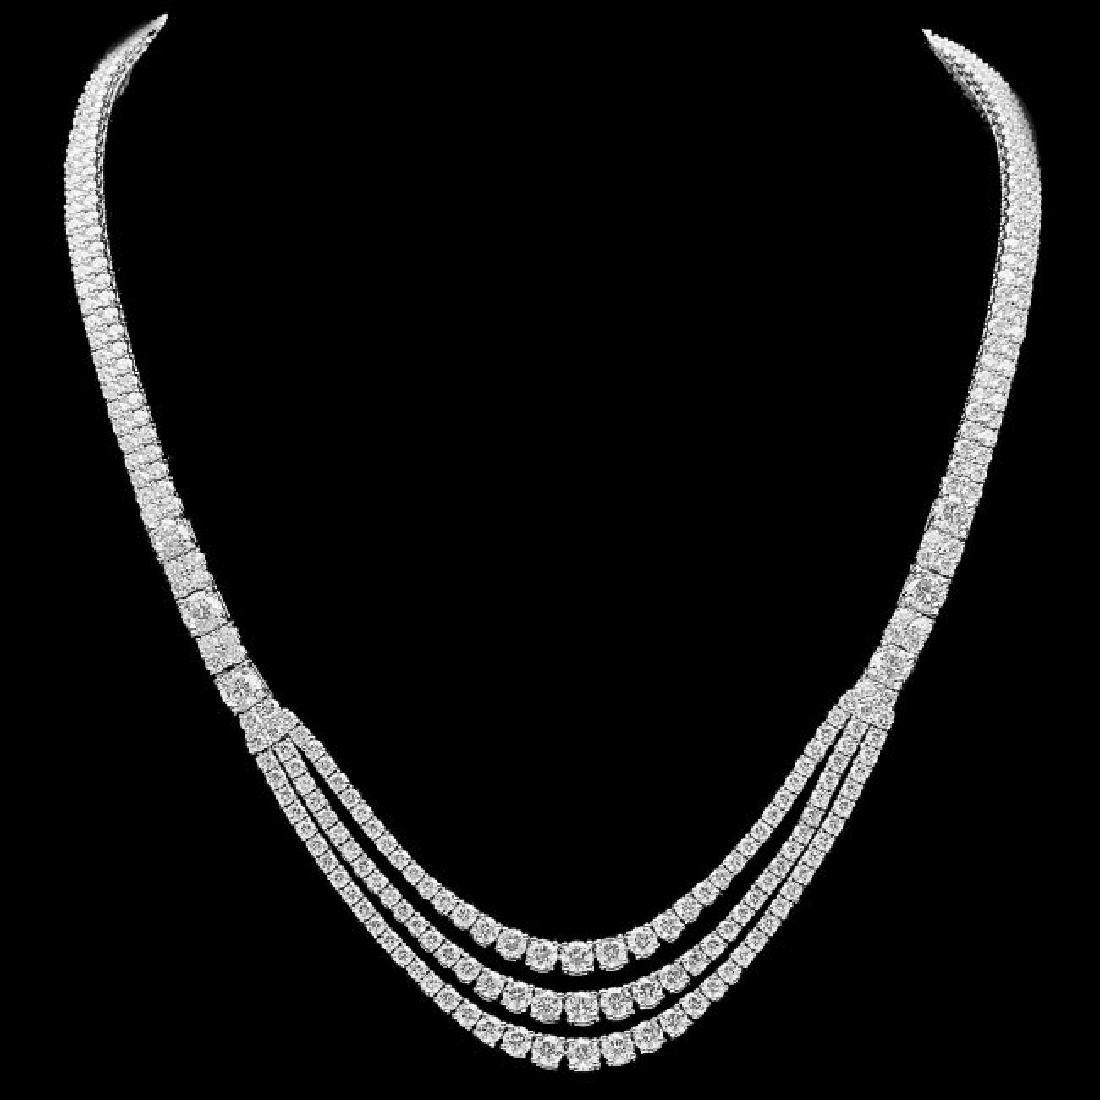 18k White Gold 23.10ct Diamond Necklace